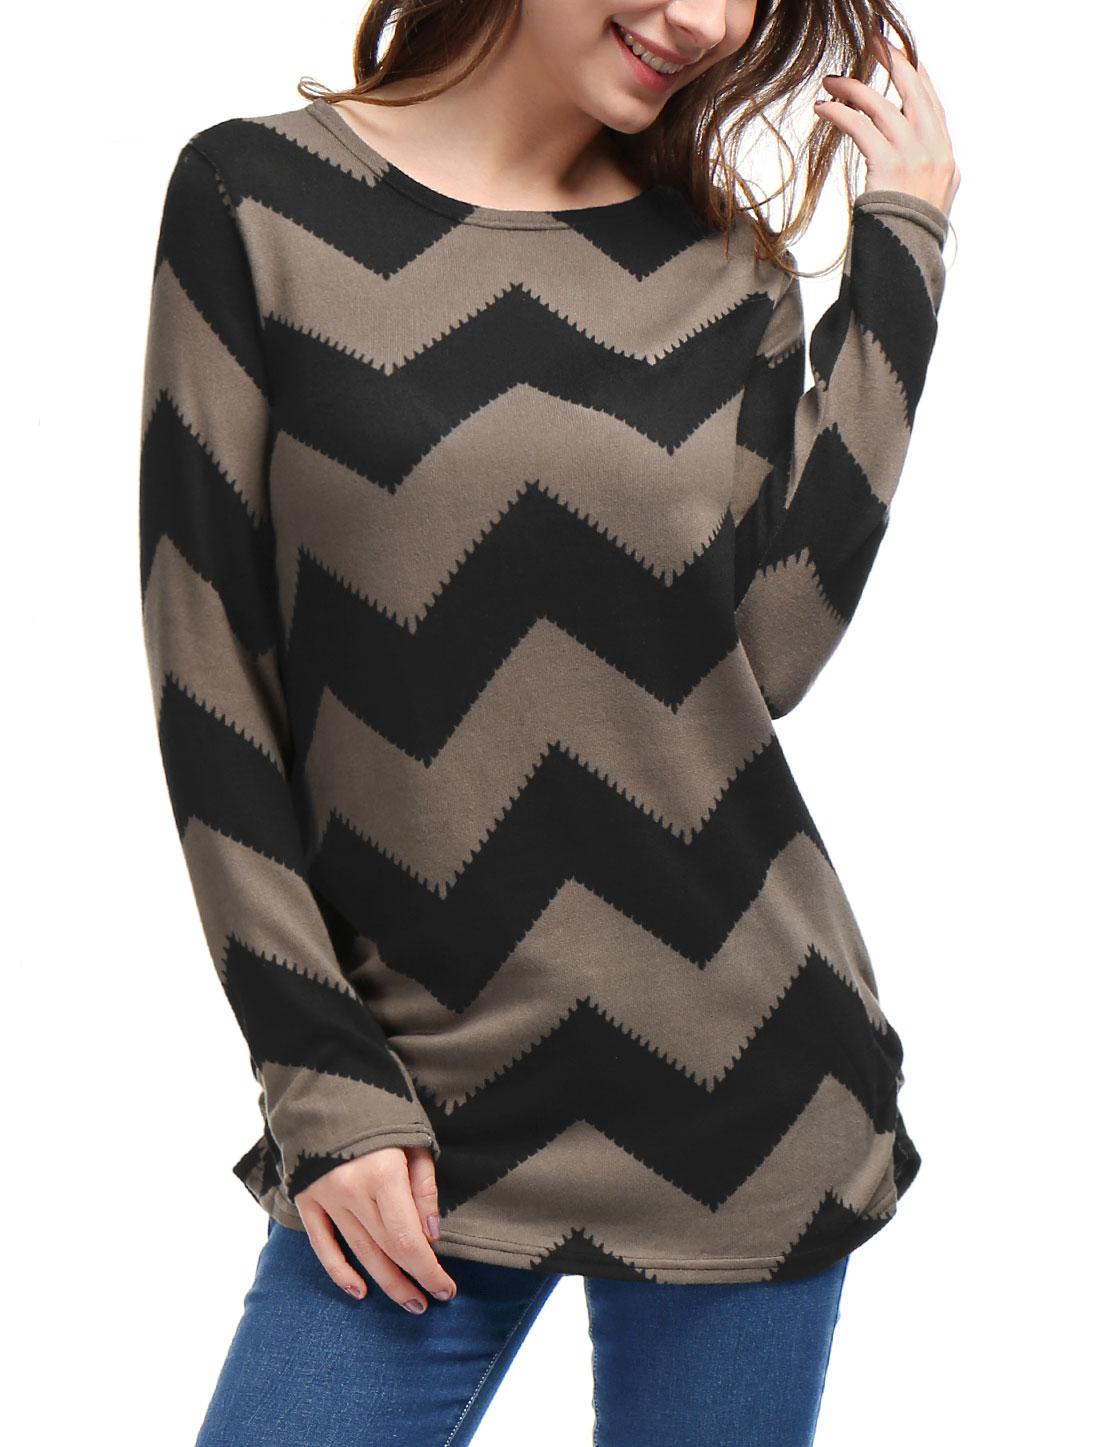 Woman Zig-Zag Pattern Knitted Loose Tunic Shirt Black Brown M